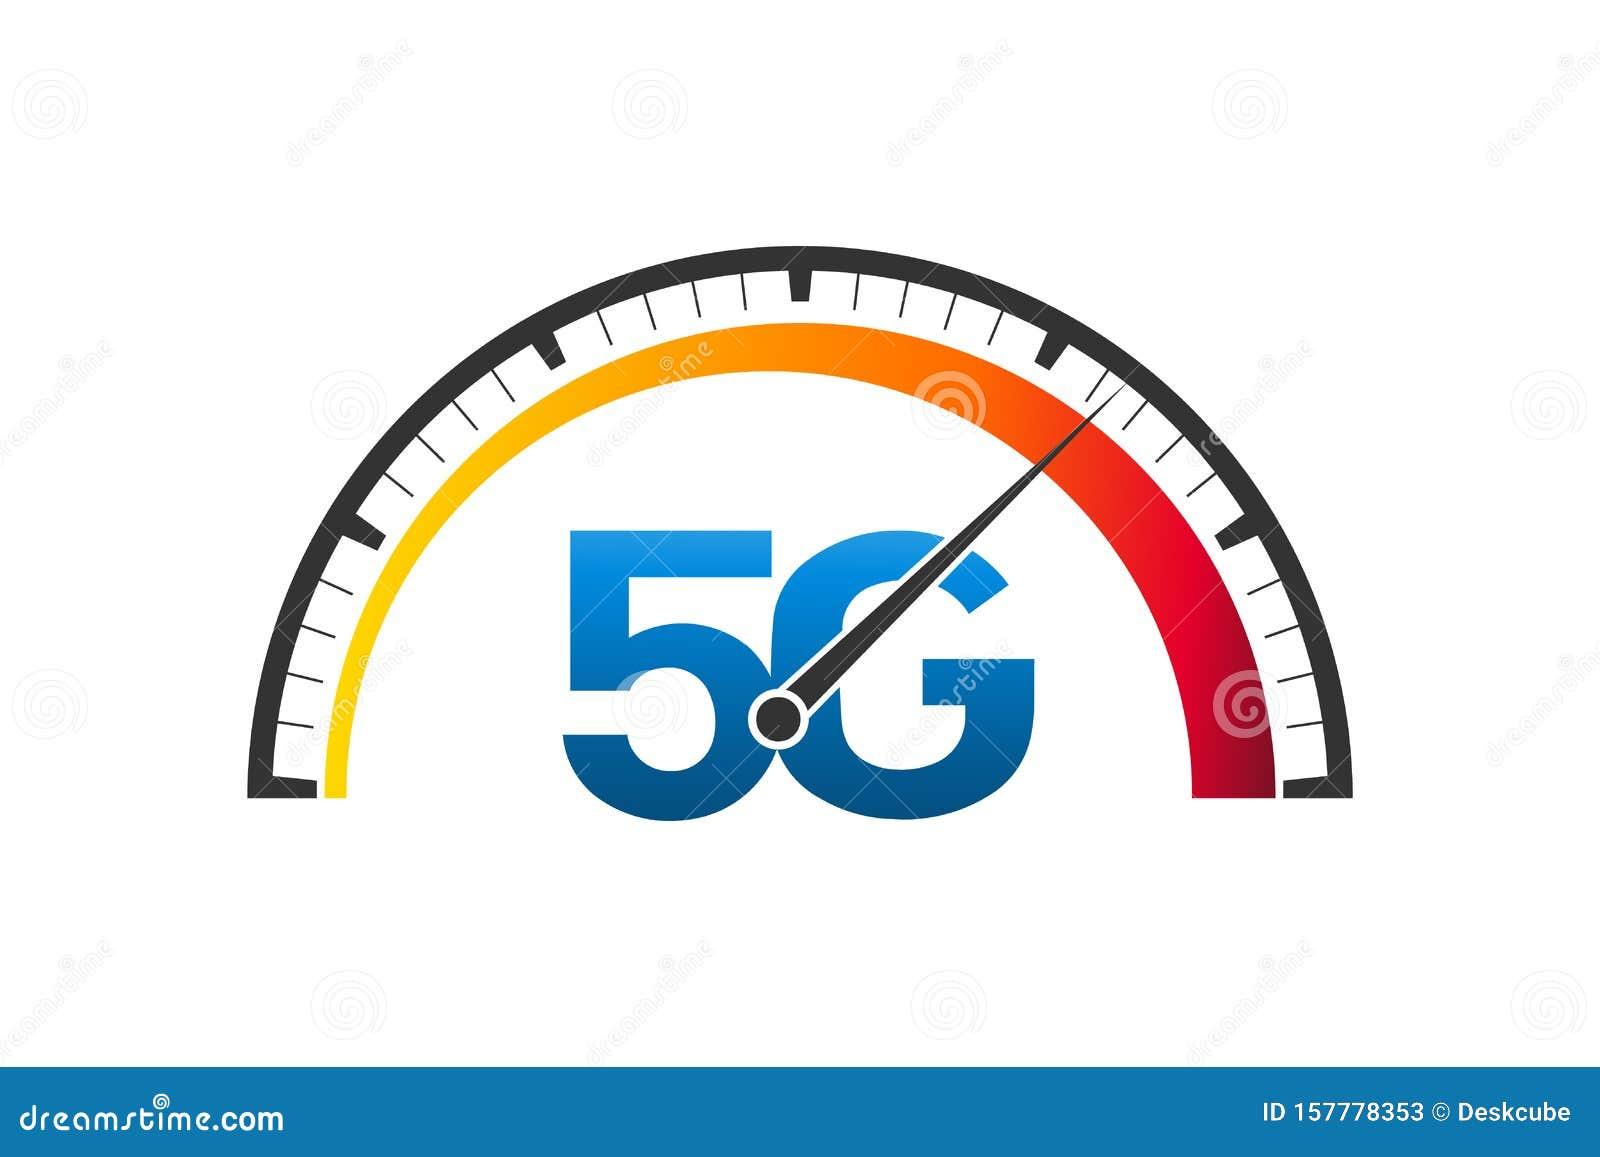 5G Fast Network Logo  Speed Internet 5g Test Concept